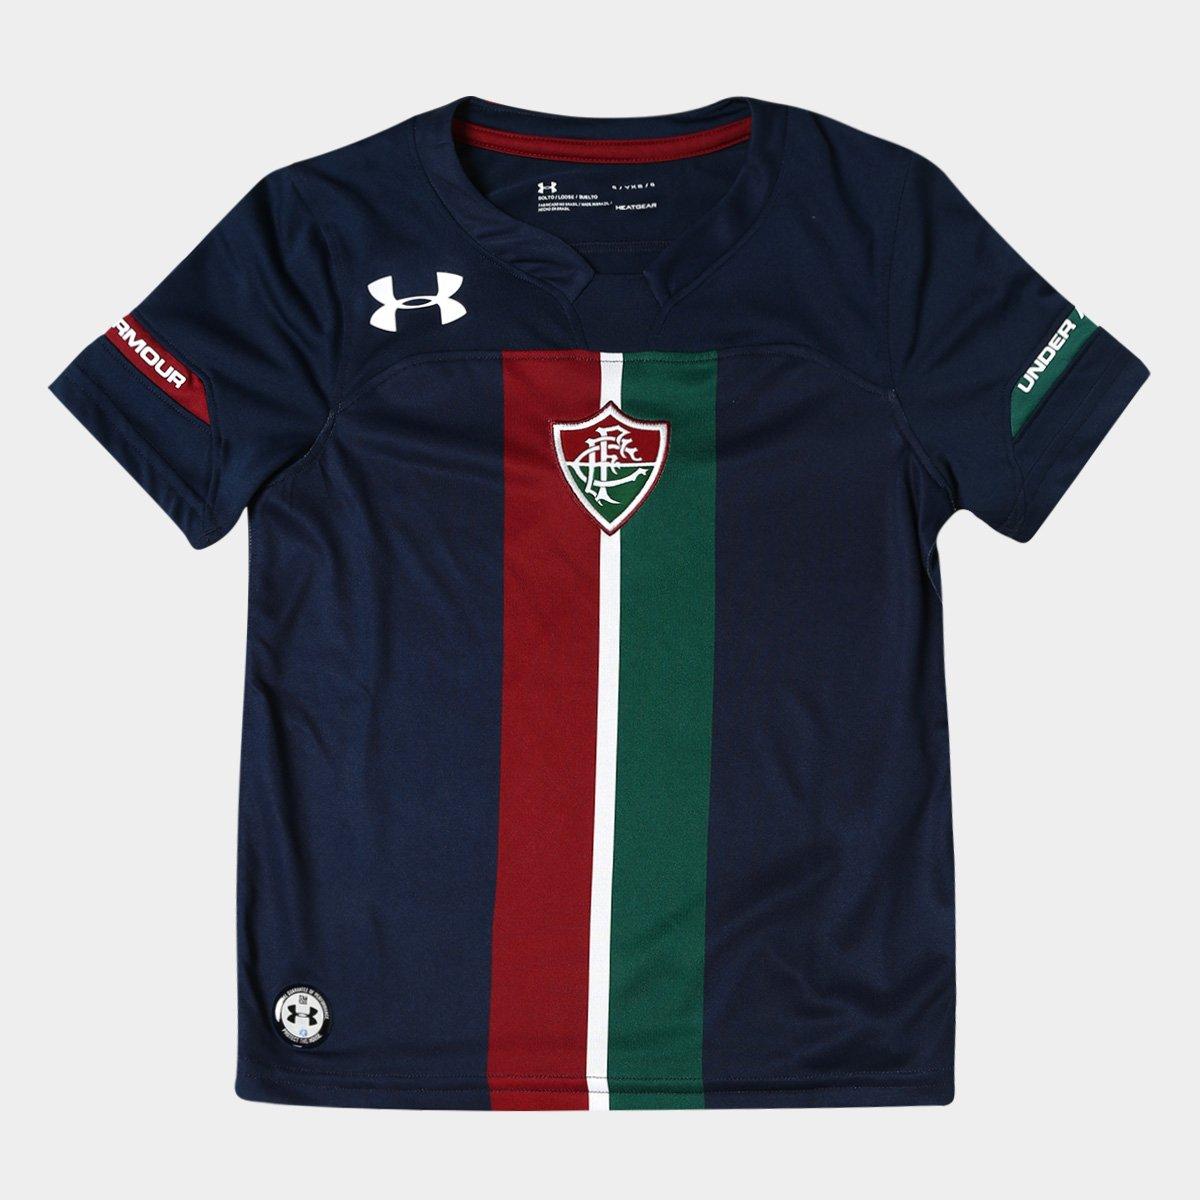 Camisa Fluminense Infantil III 19 20 s n° - Torcedor Under Armour ... 08128ac6b9dcc